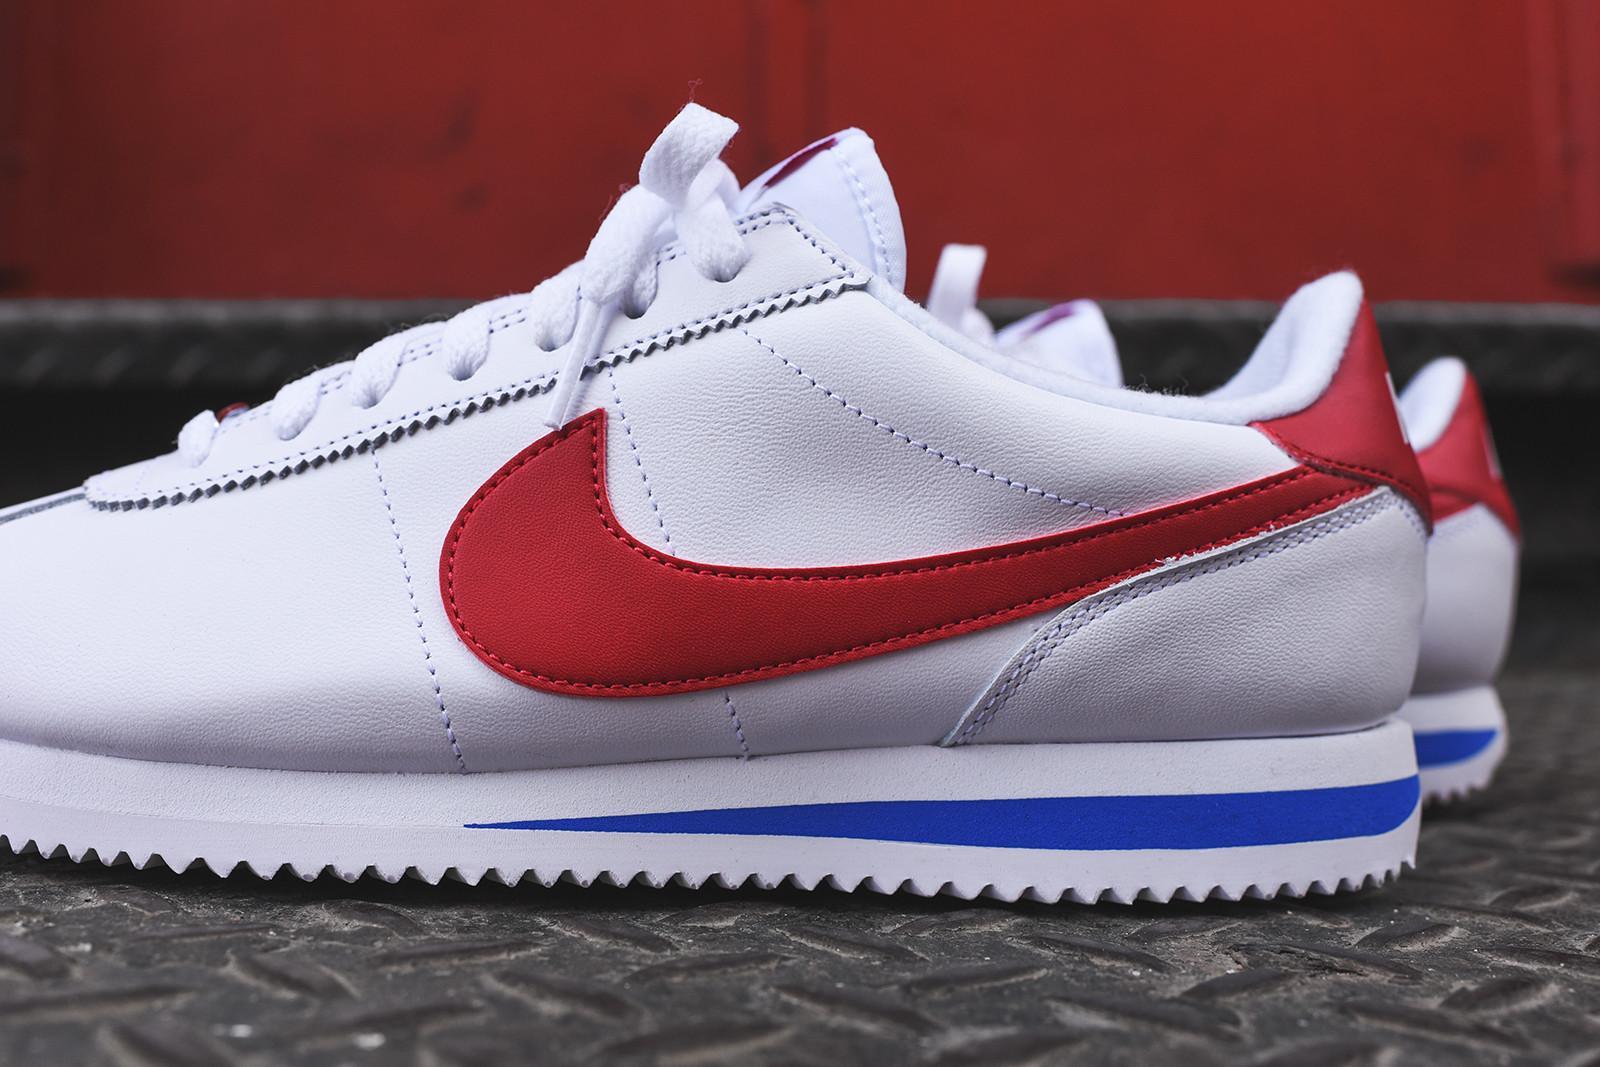 big sale 1a21f f0c44 Out Now: Nike Cortez OG • KicksOnFire.com